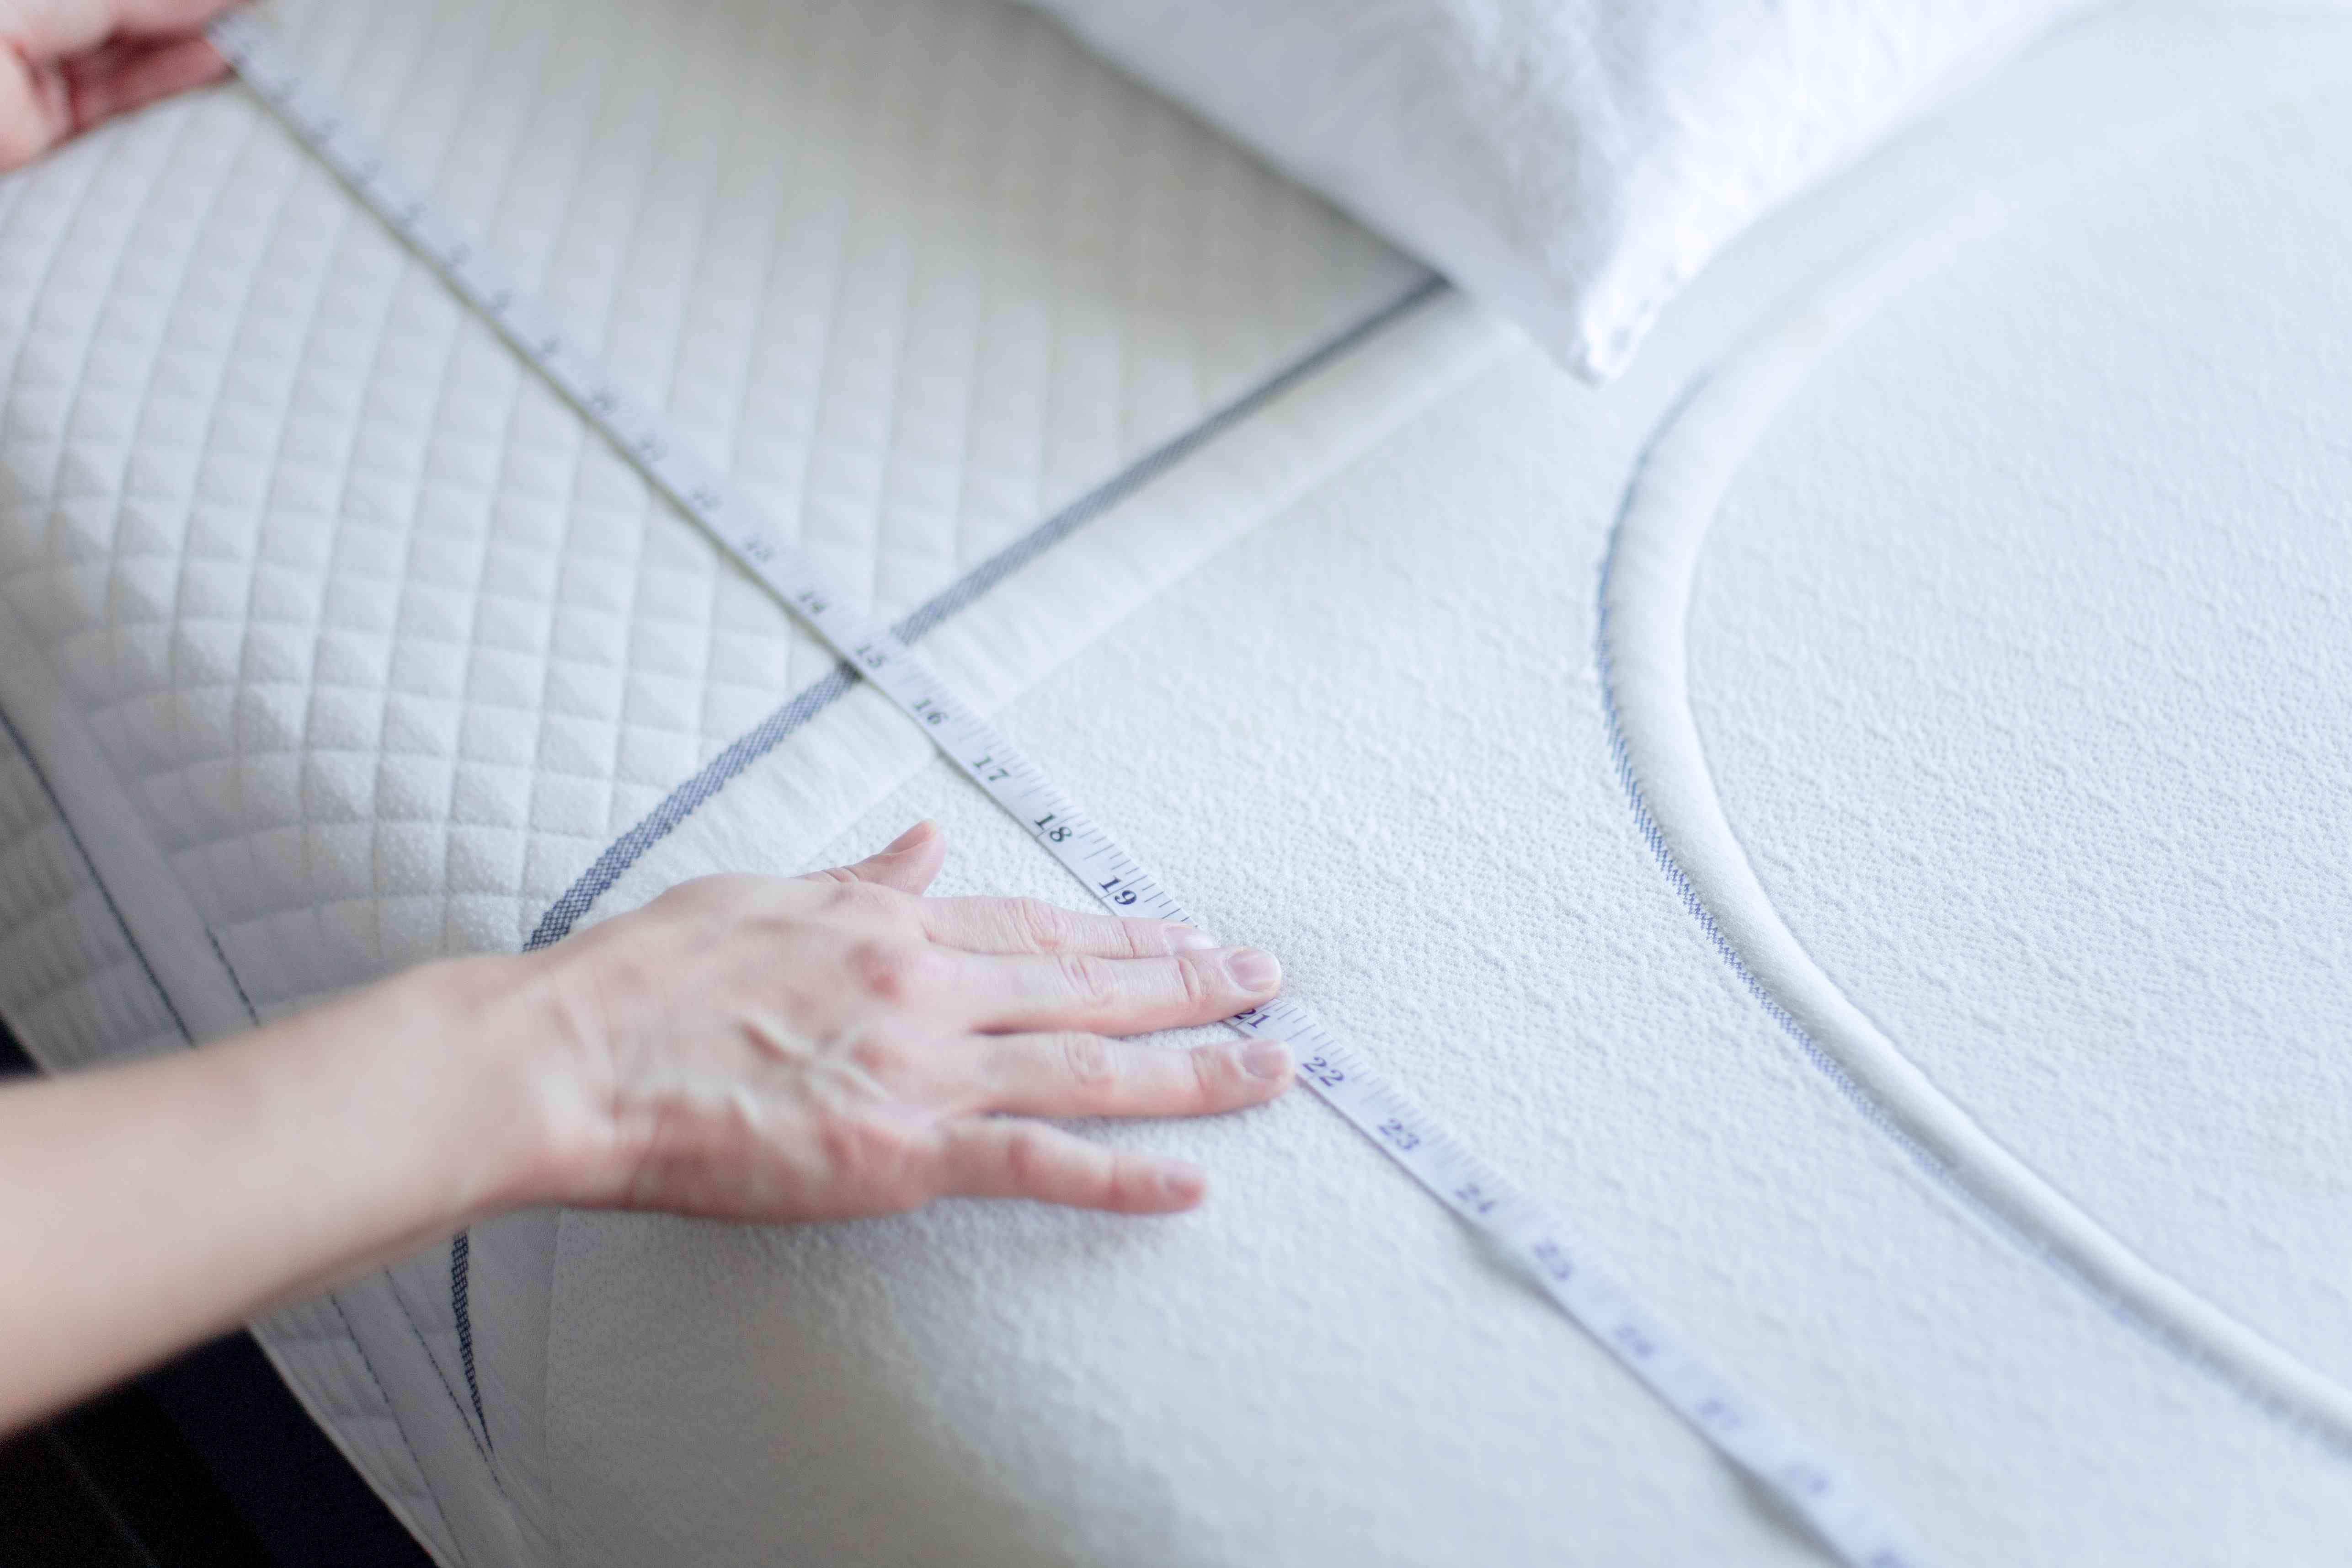 person taking a mattress measurement